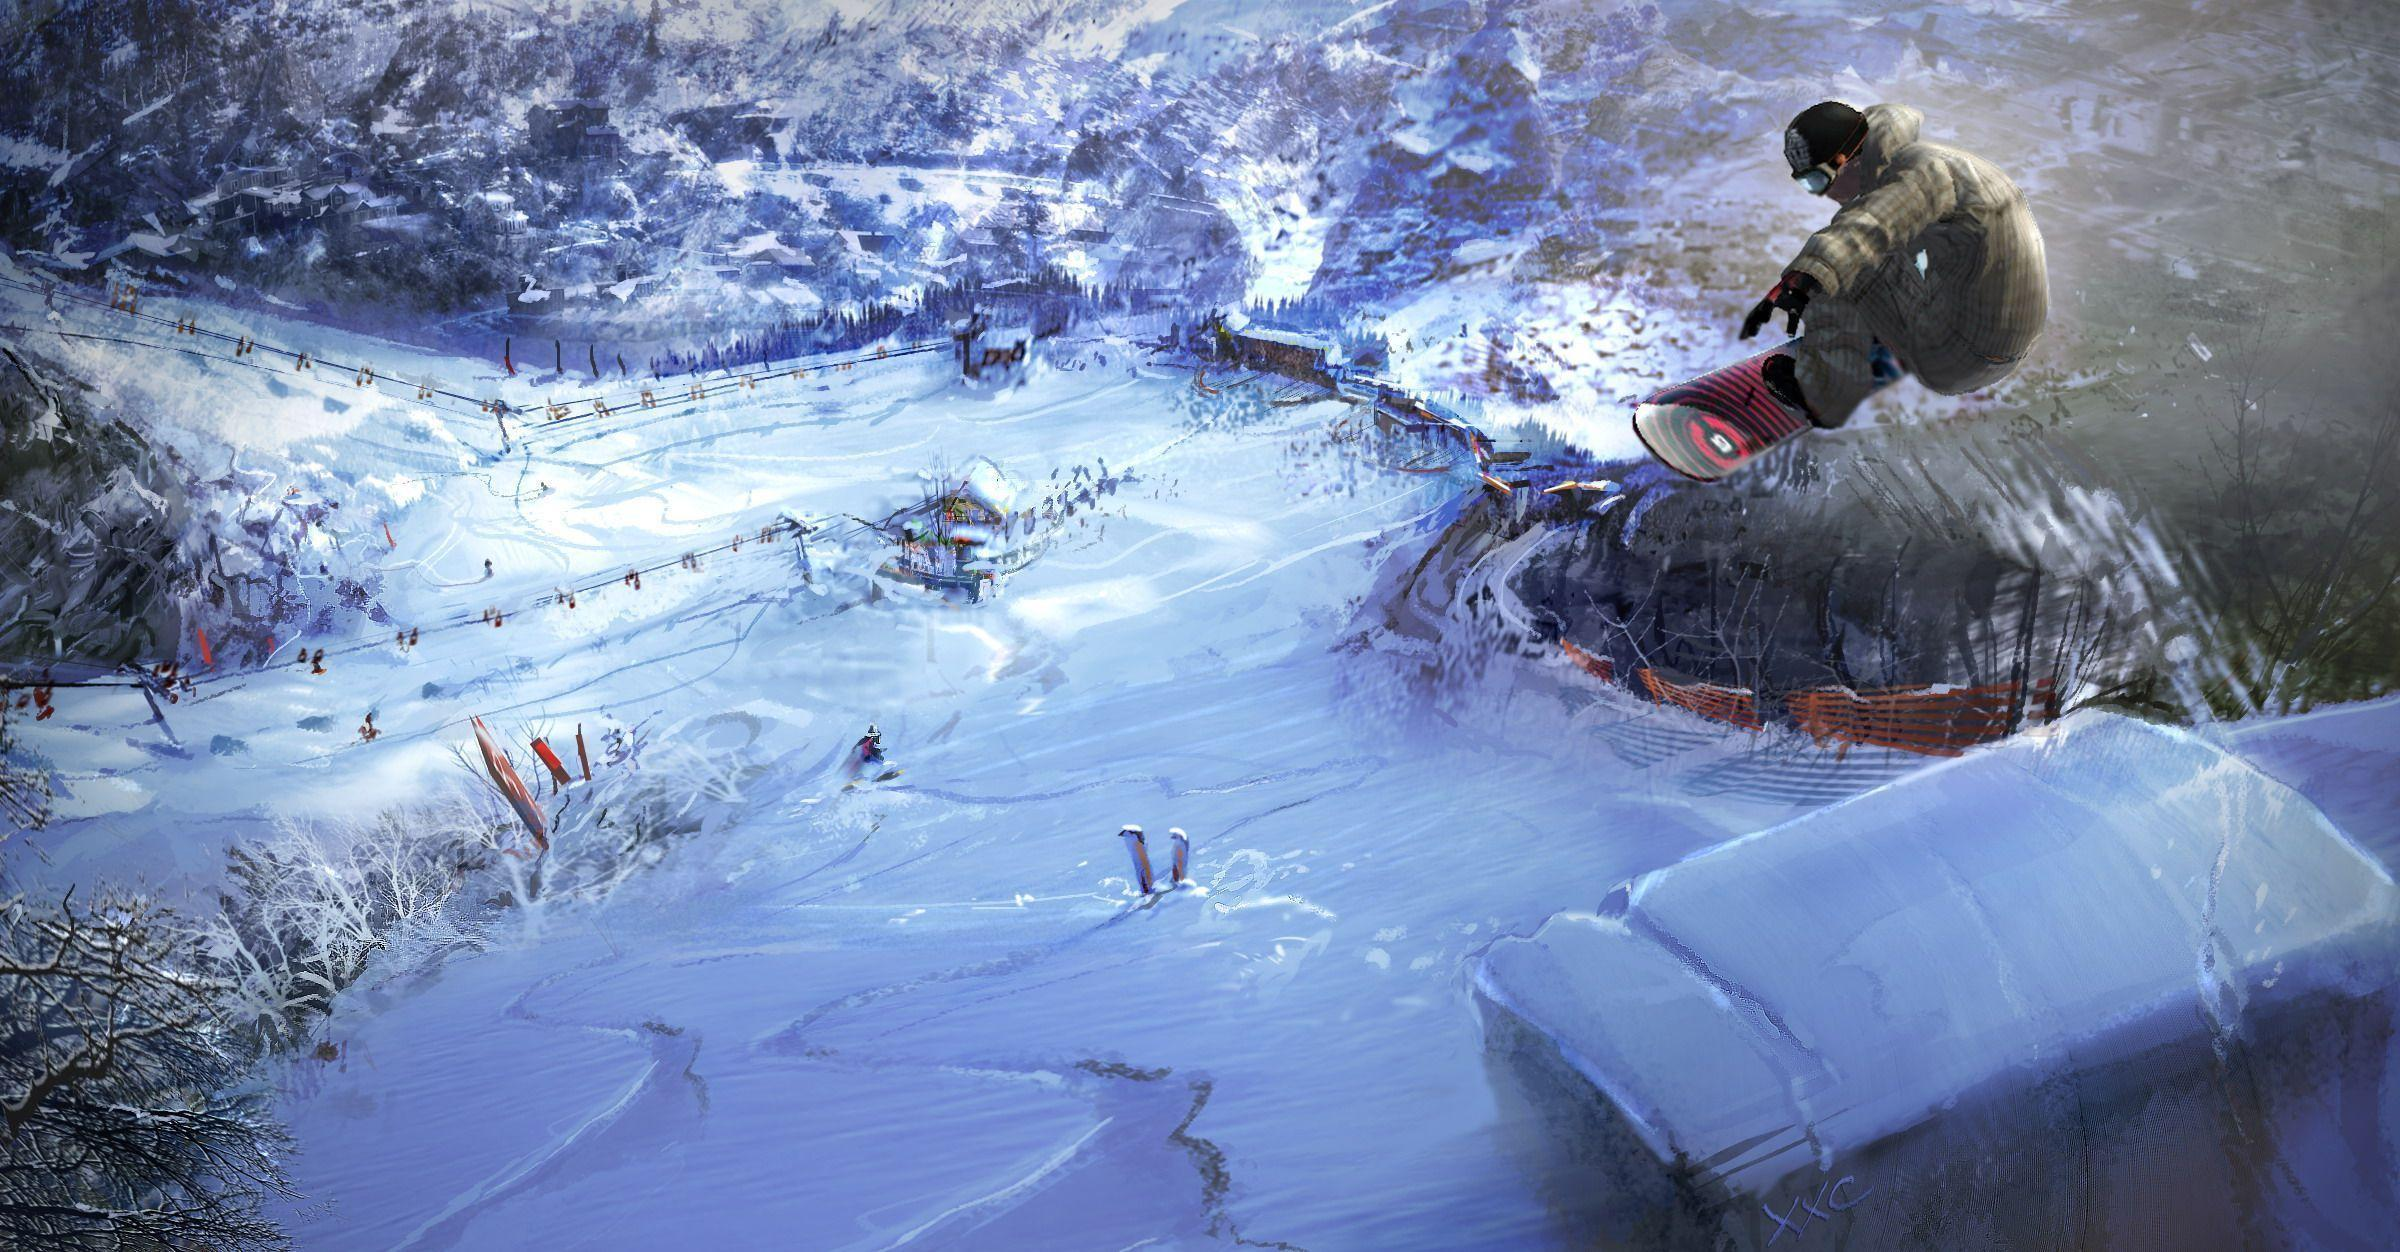 snowboarding wallpapers wallpaper cave